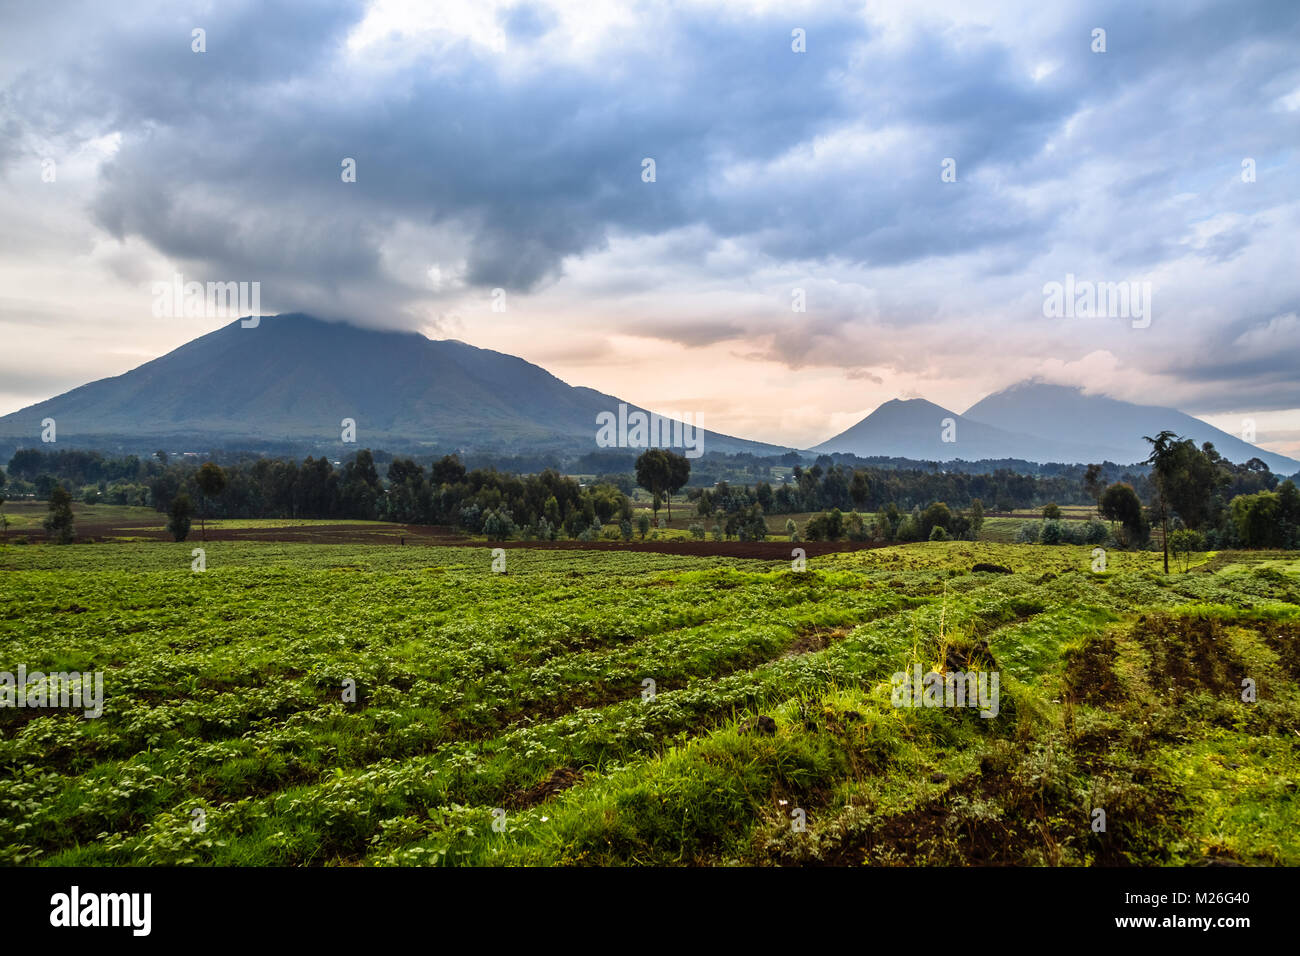 Virunga volcano national park landscape with green farmland fields in the foreground, Rwanda - Stock Image